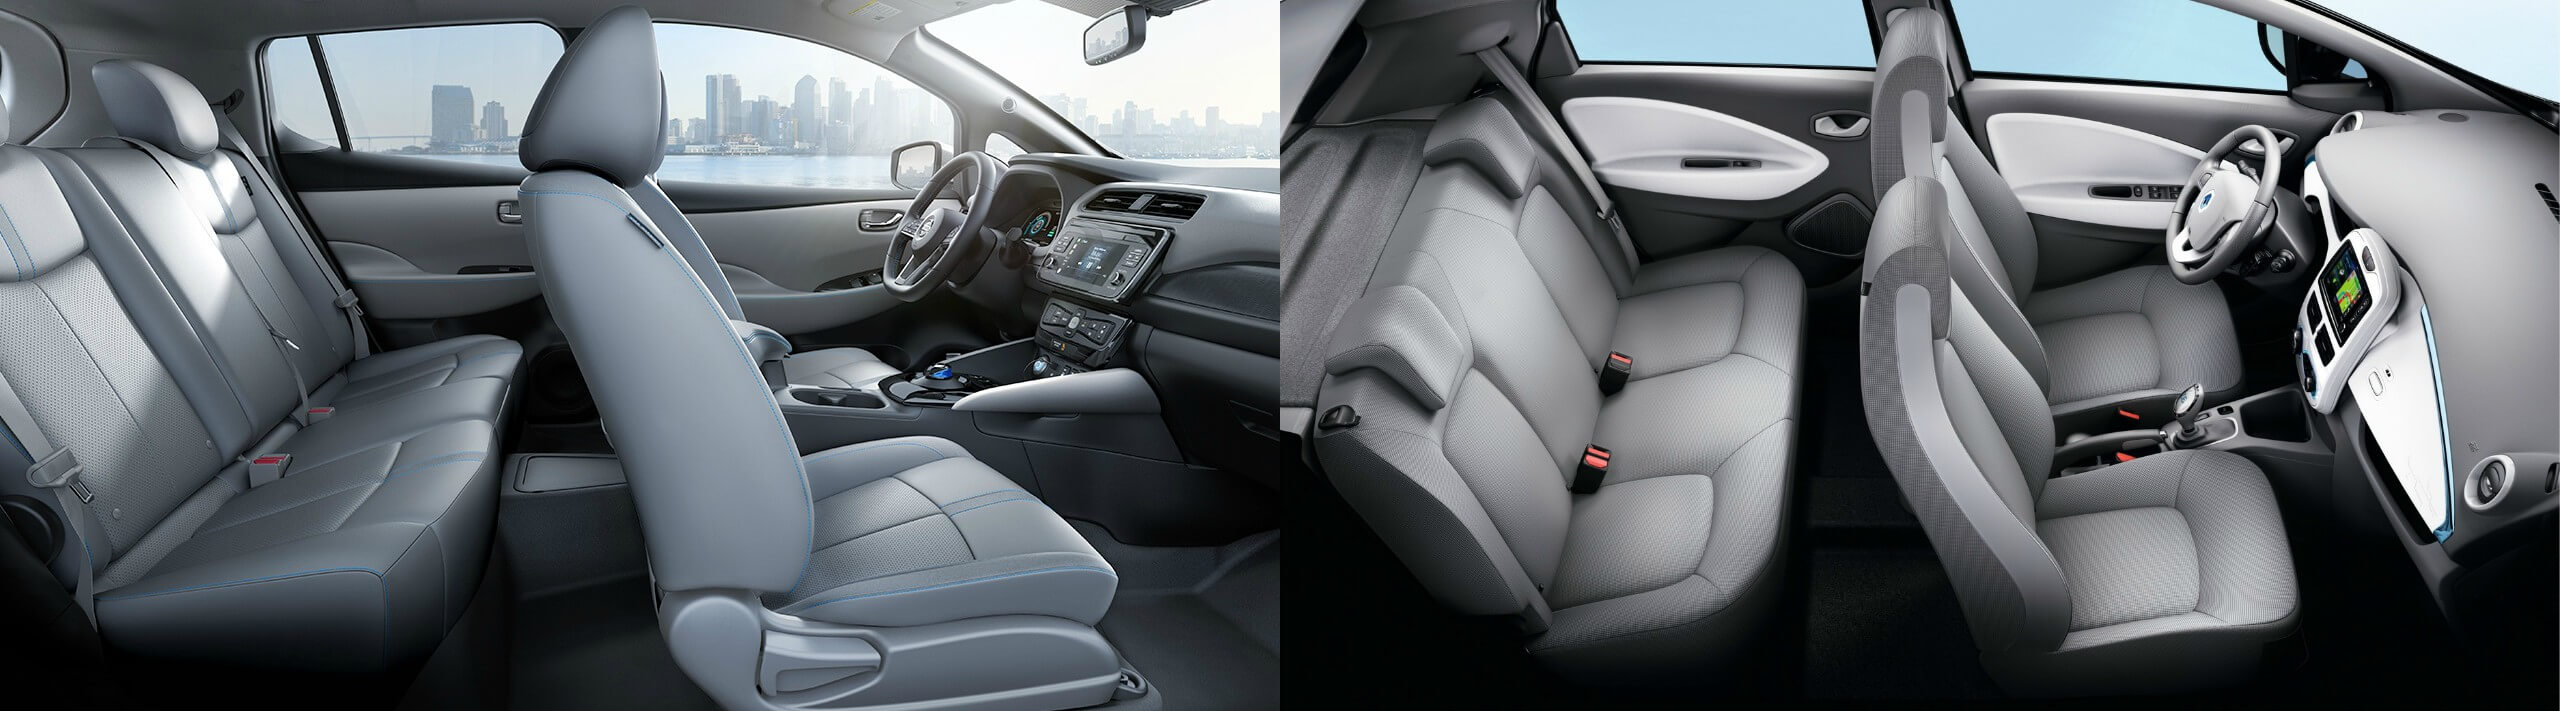 Салон Nissan Leaf (слева) и Renault ZOE (справа)